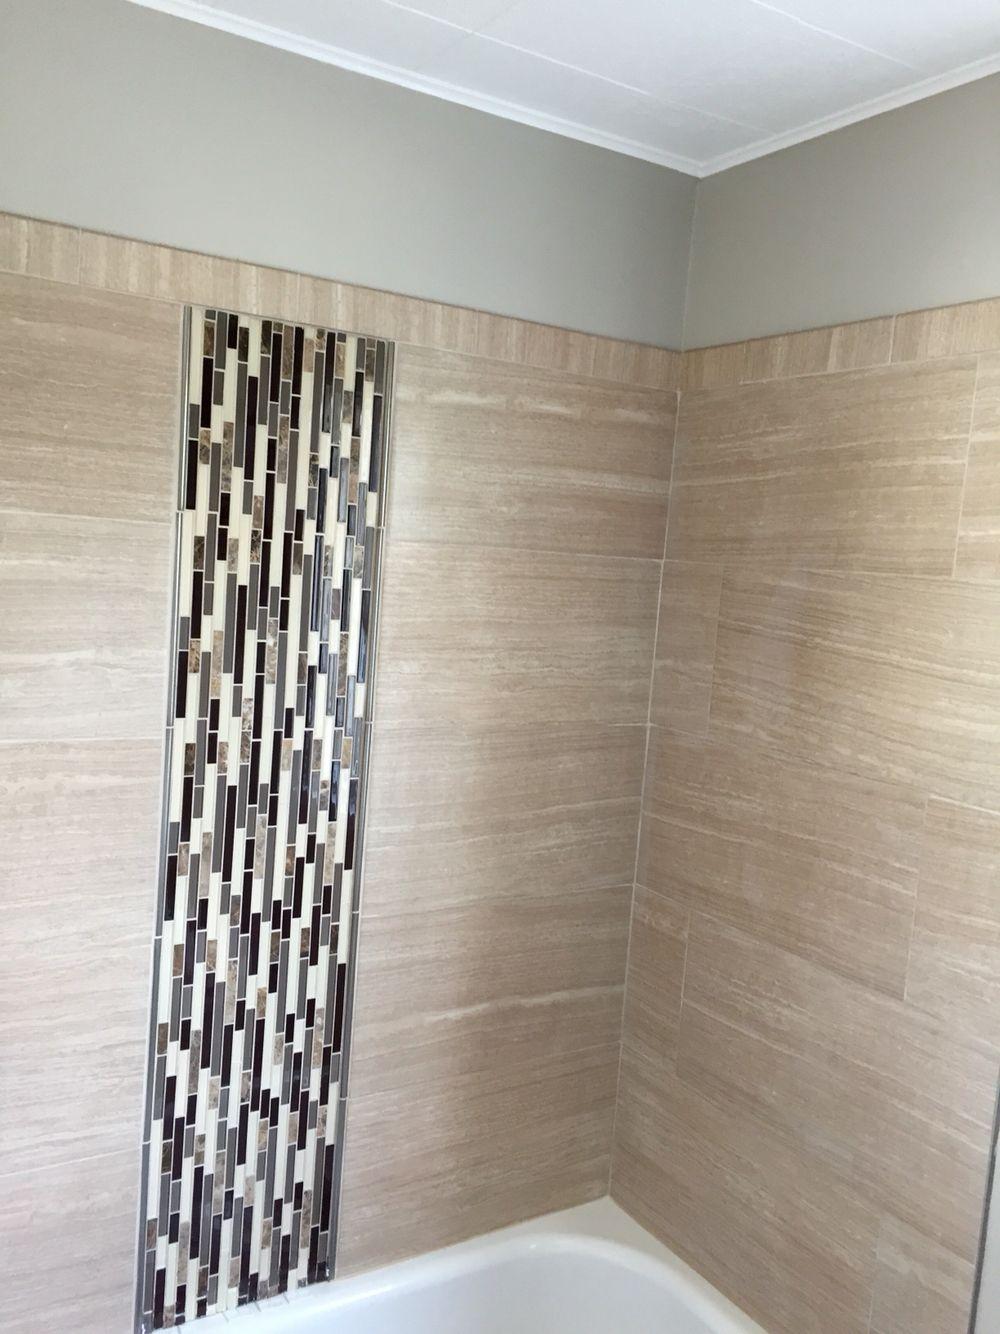 Leonia Sand Bathroom Tub Surround 12x24 Bathroom Tub